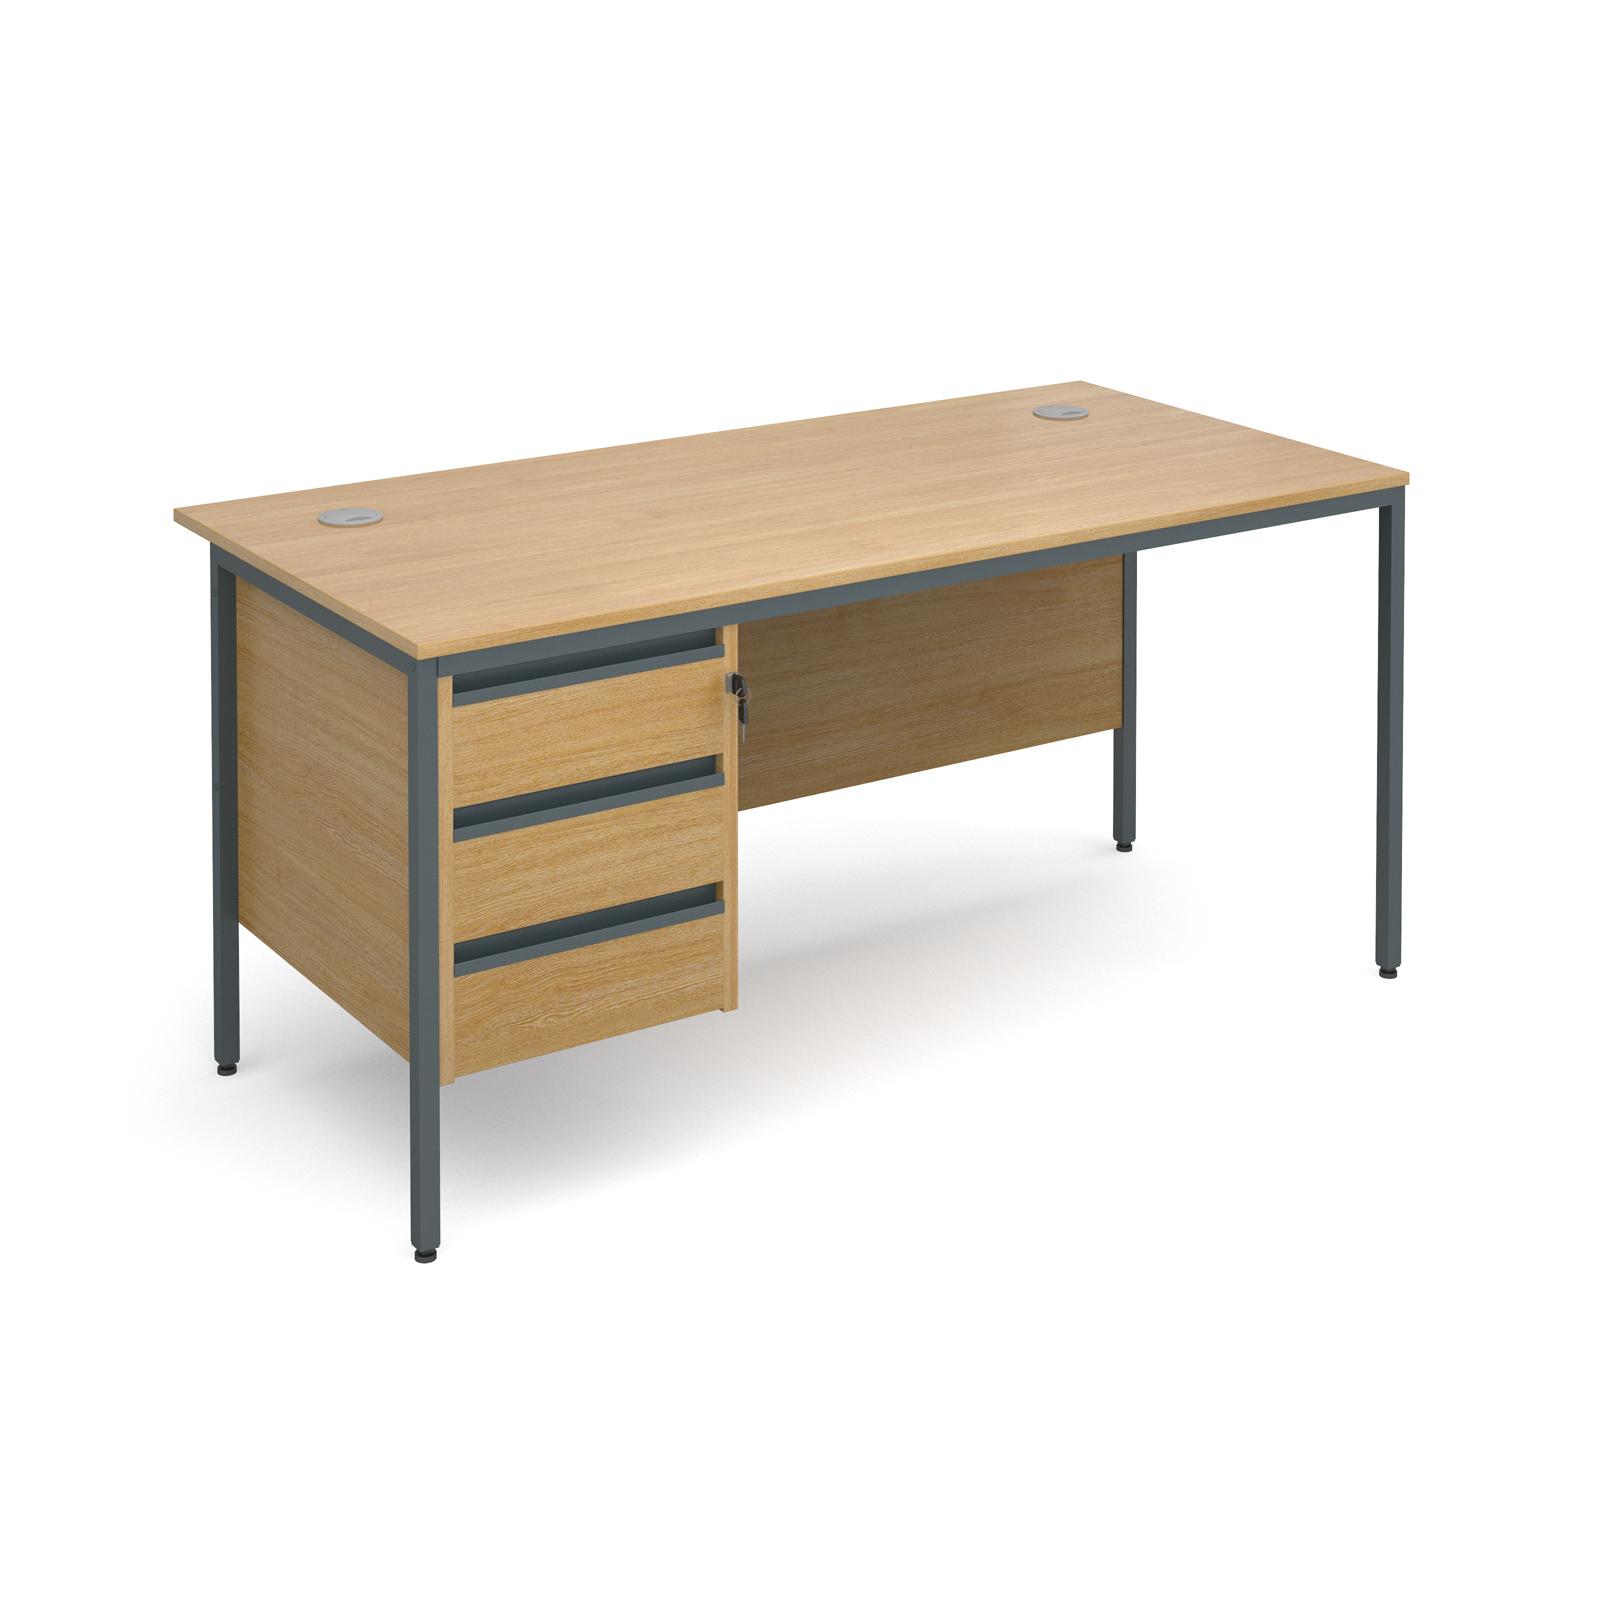 Maestro H frame straight desk with 3 drawer pedestal 1532mm - oak